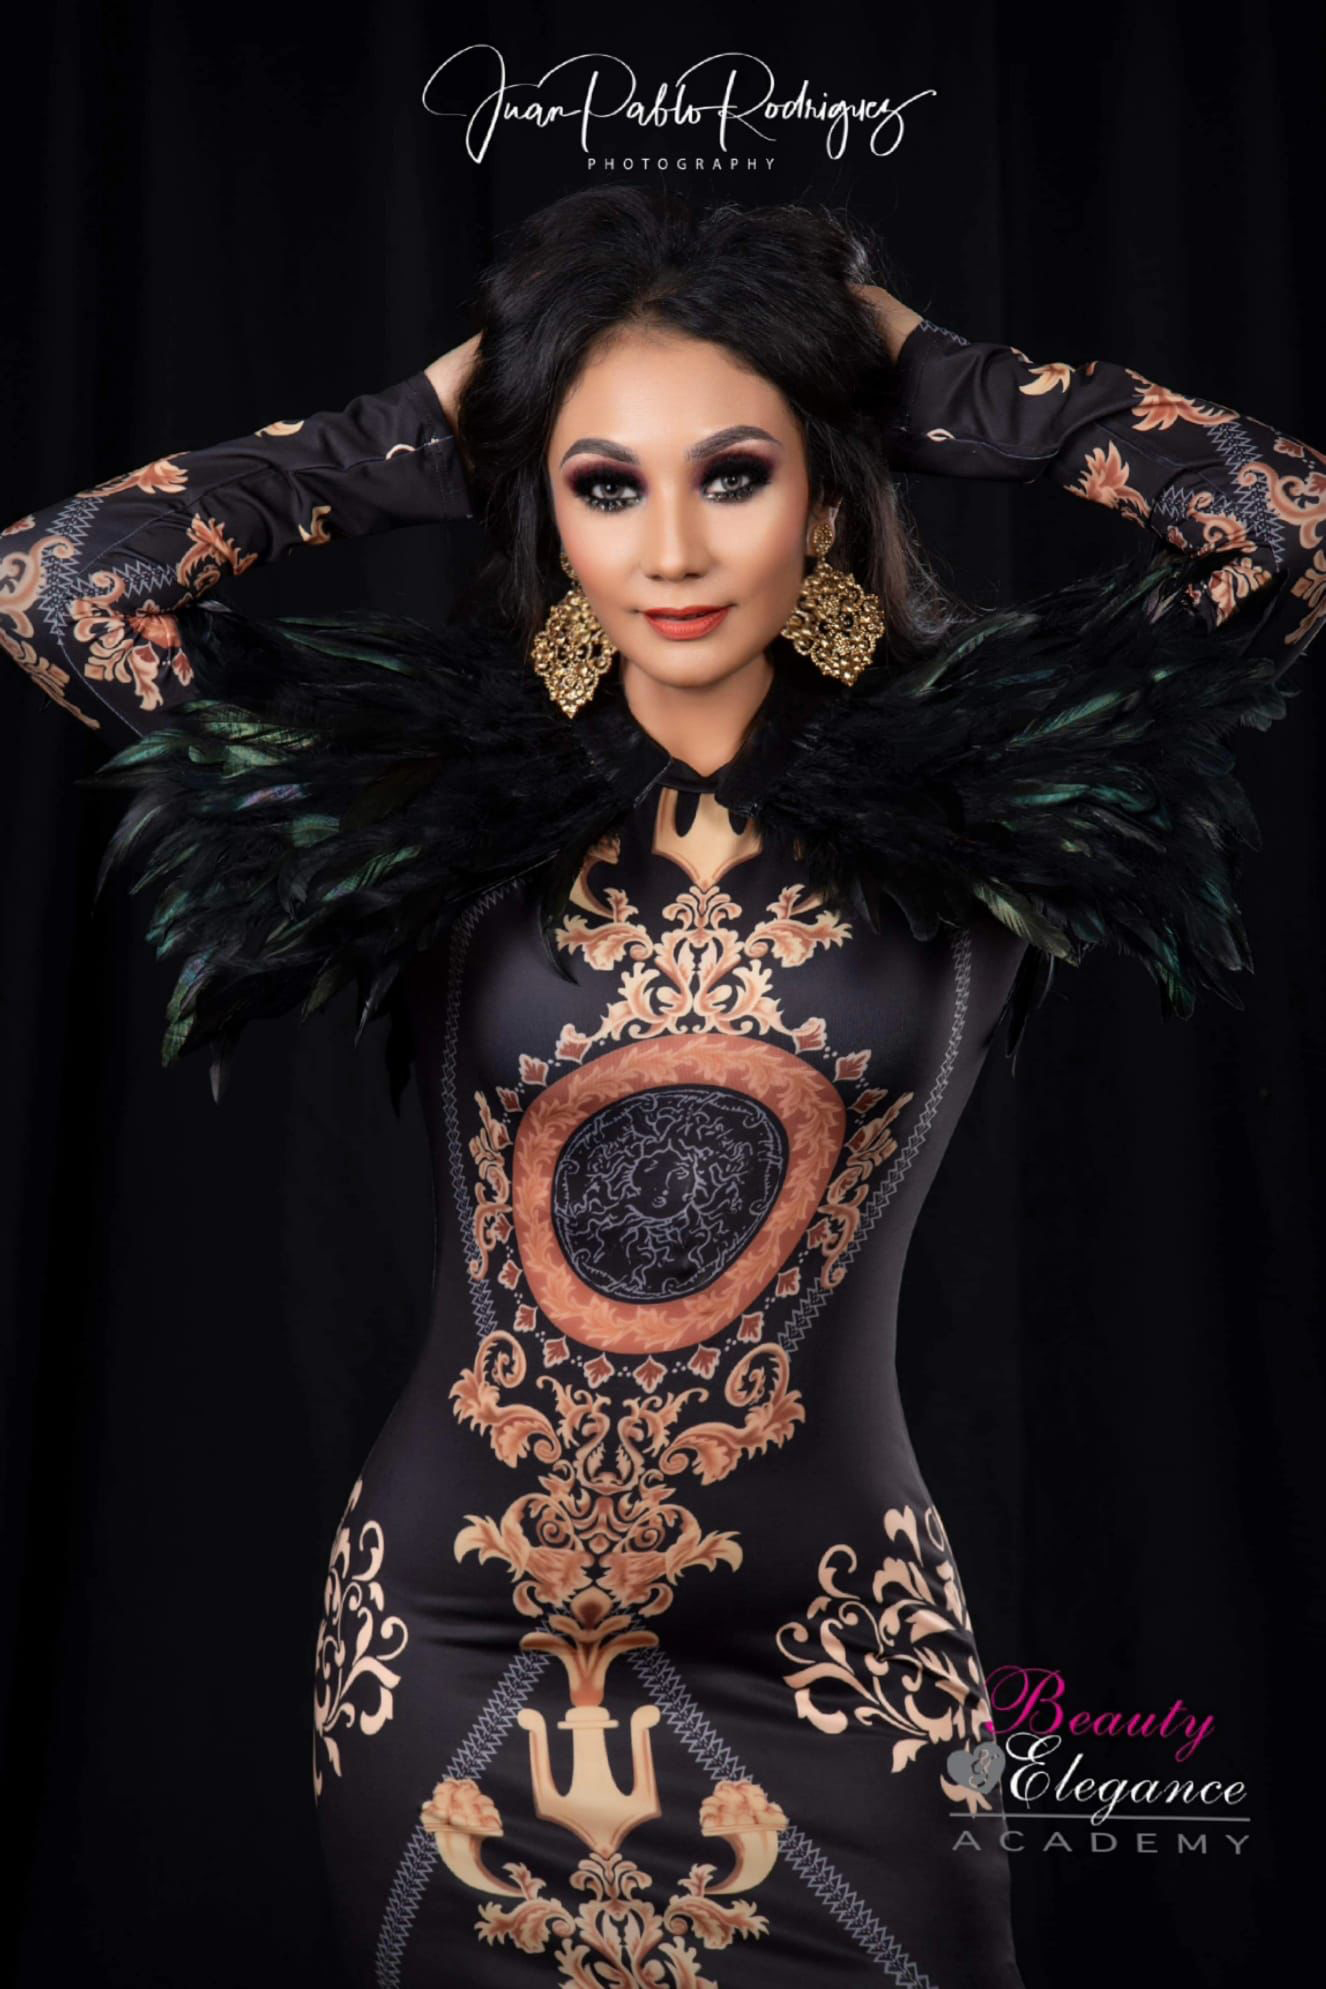 Lisandra Quintero